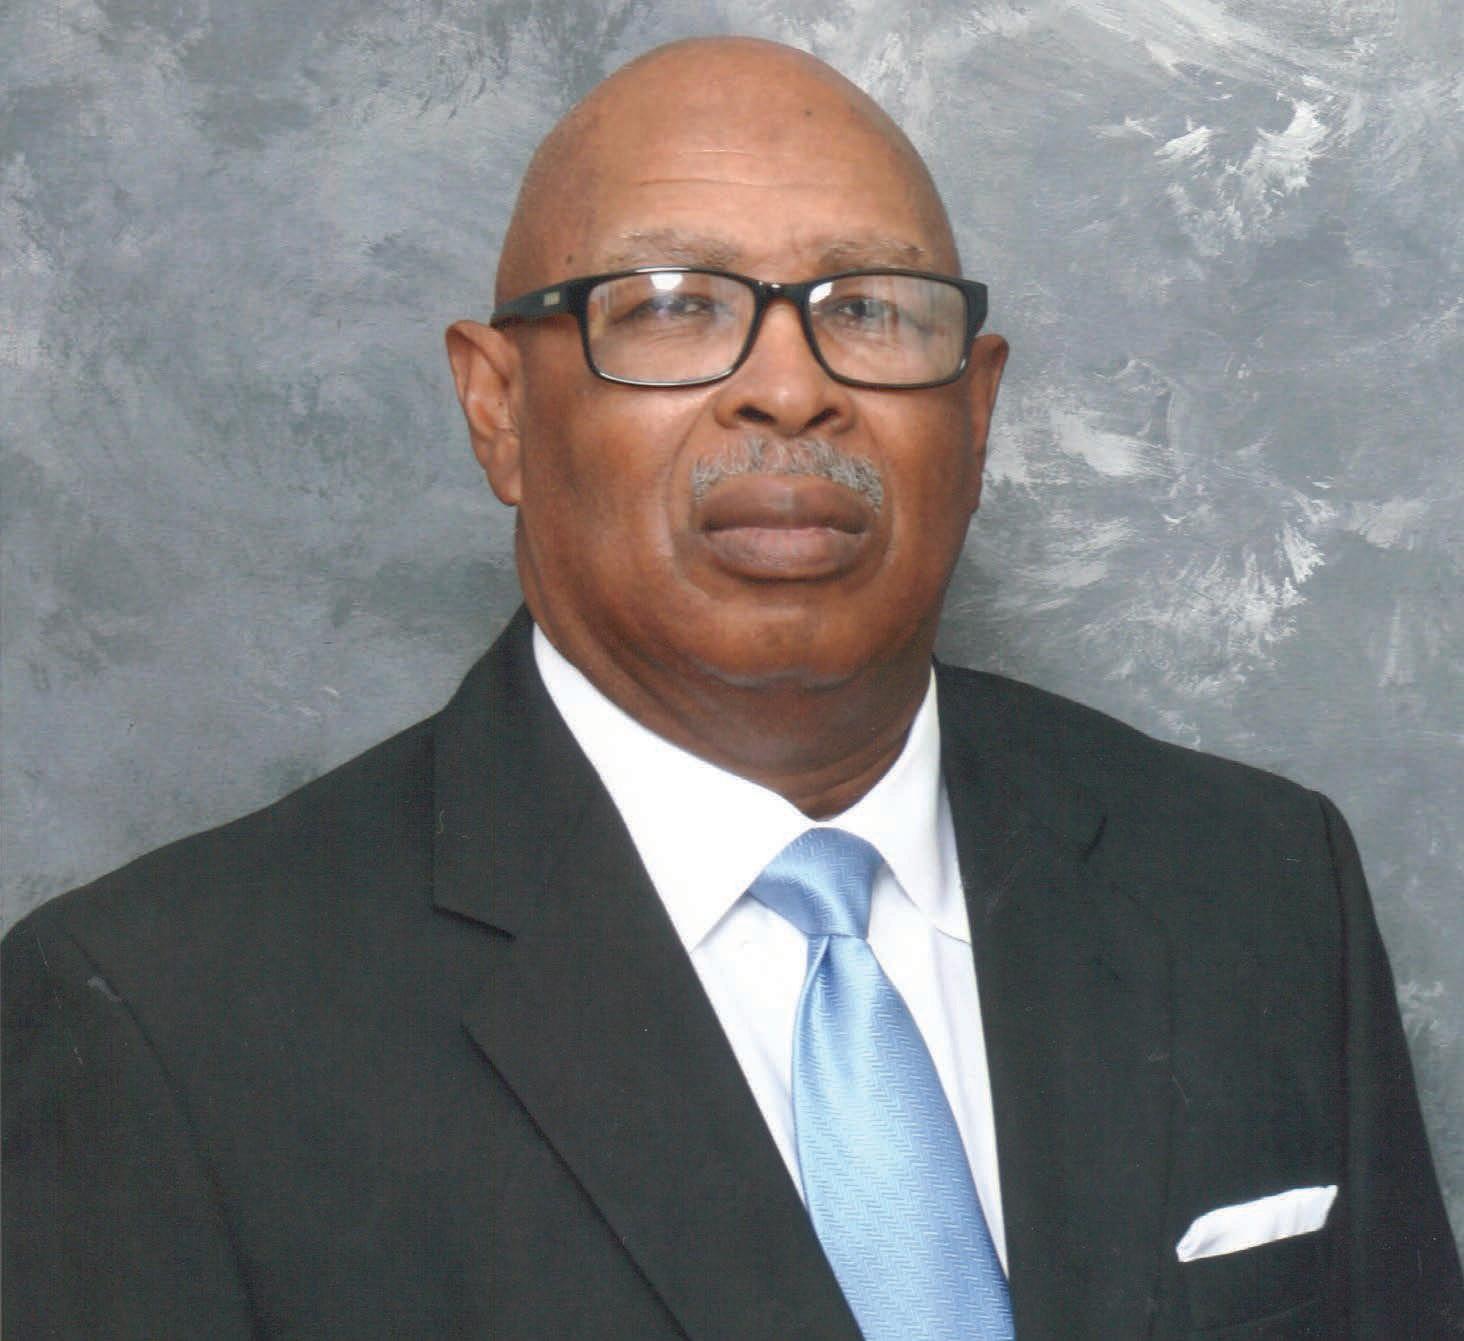 Frankie Thompson, President and CEO of Frankie Thompson Enterprises, Inc. (FTE)